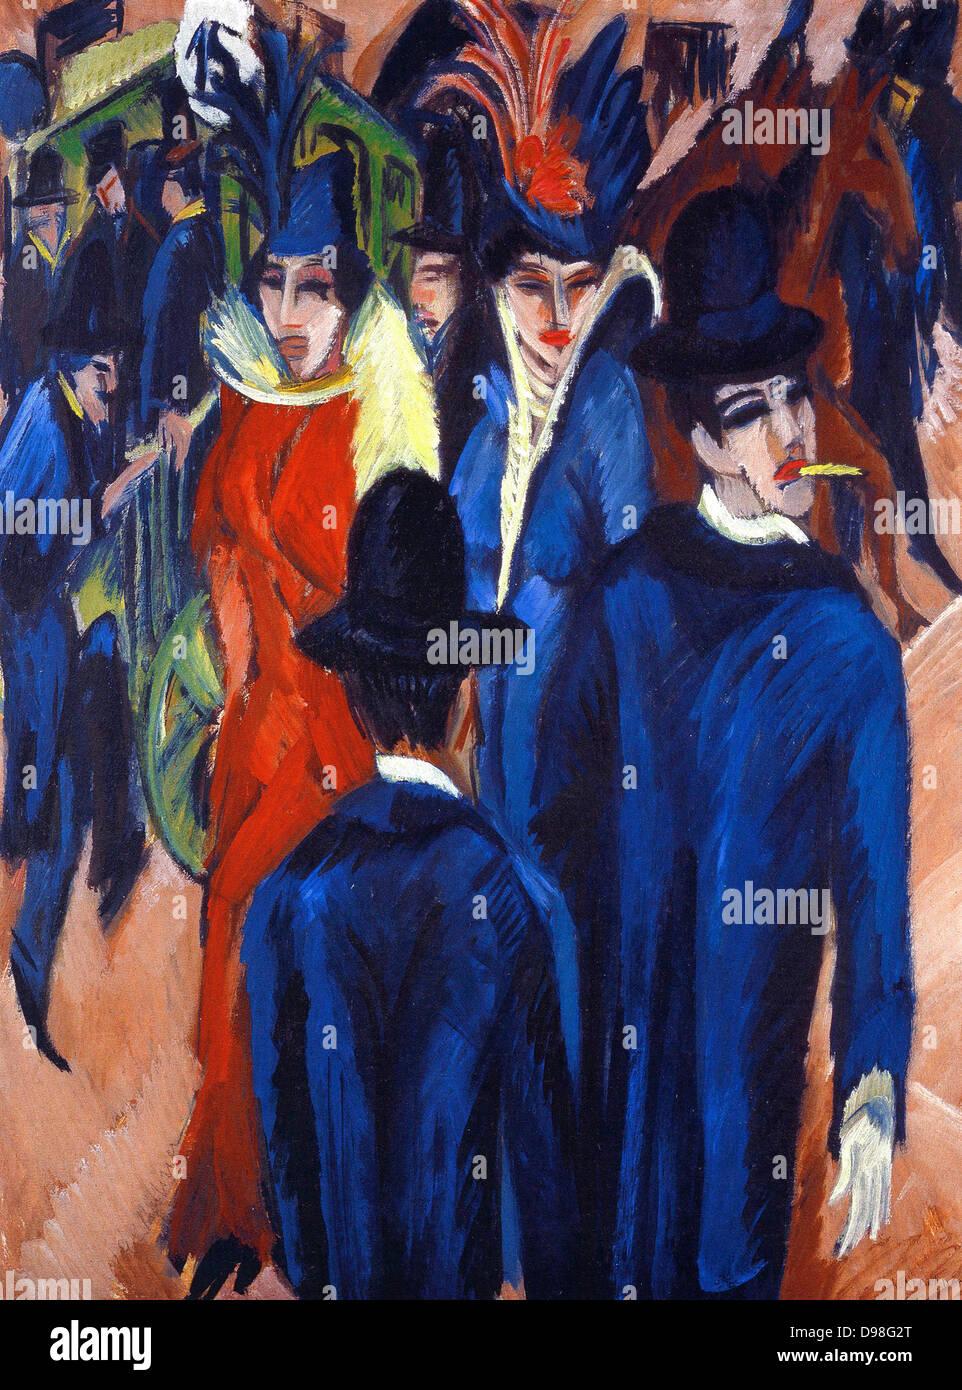 Ernst Ludwig Kirchner (6 May 1880 – 15 June 1938), German expressionist painter Berlin-Street-Scene - Stock Image